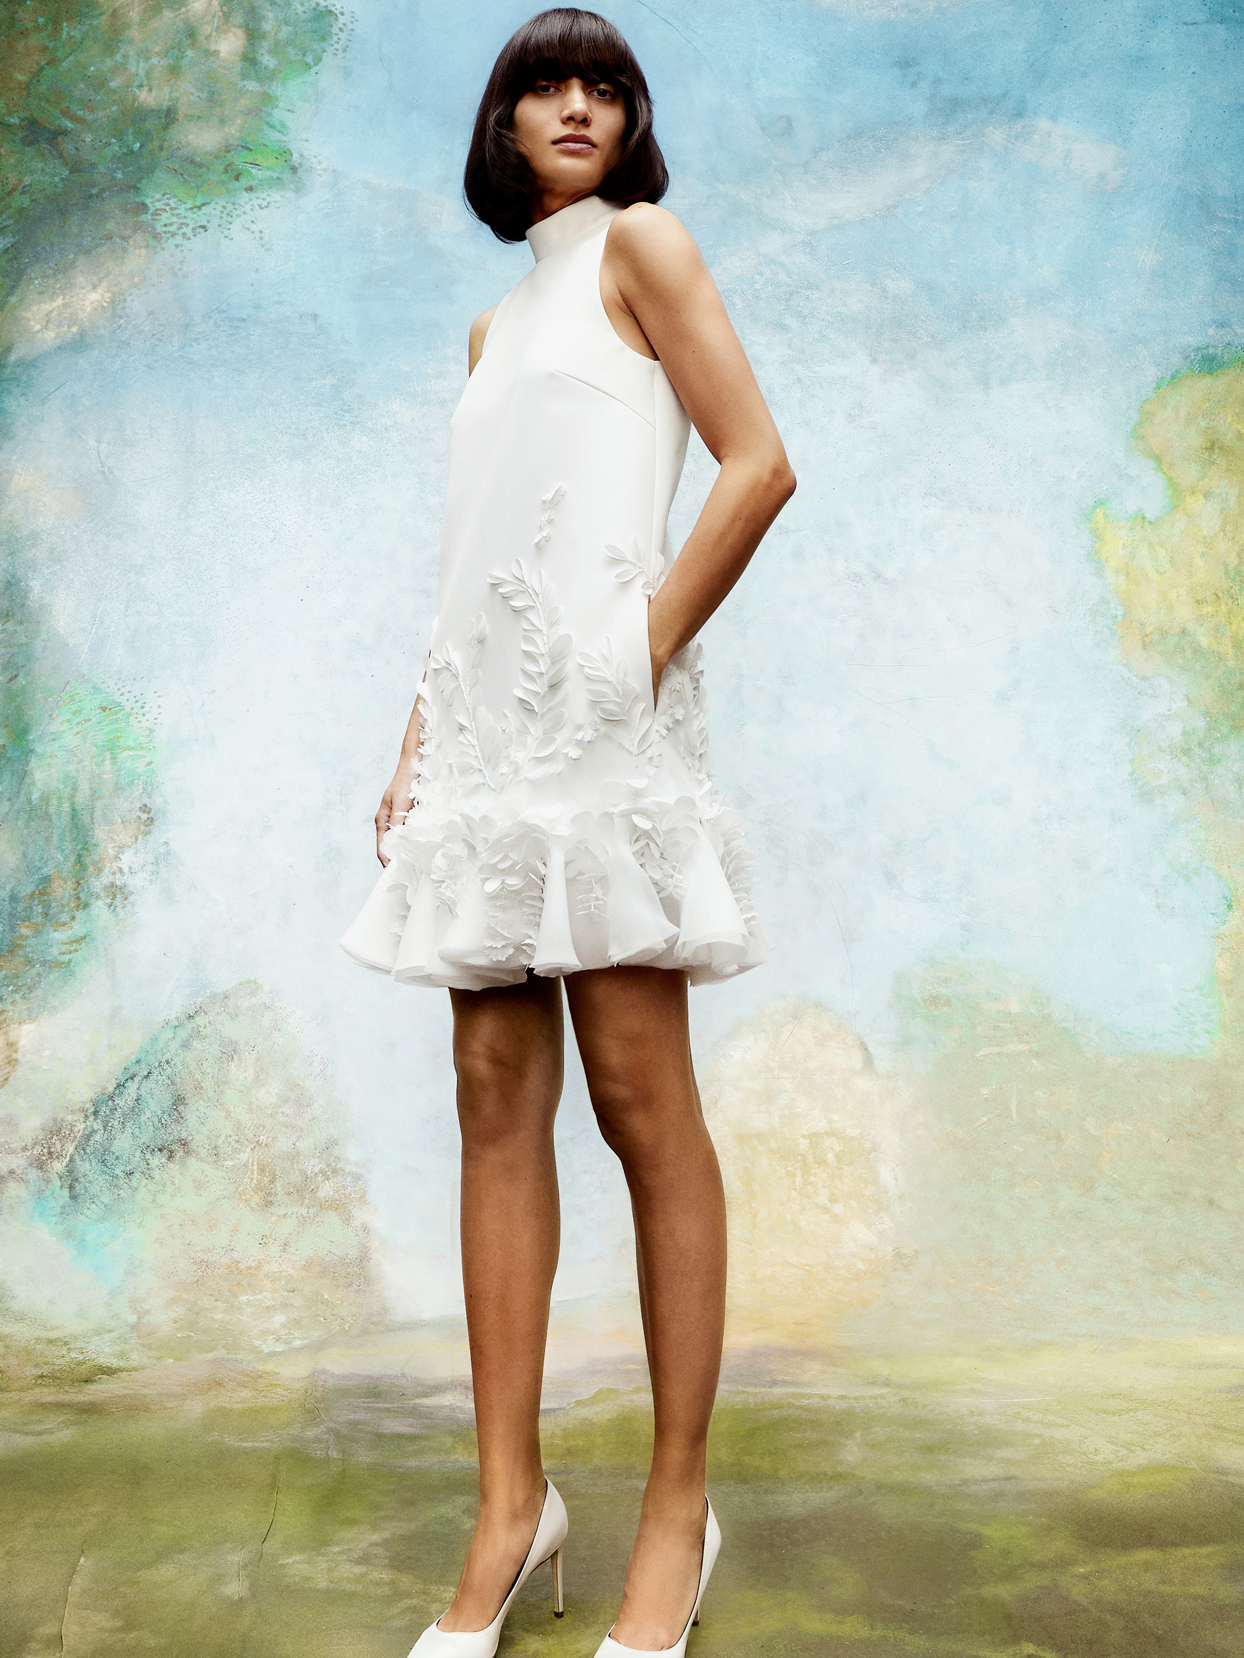 viktor and rolf high-neckline short wedding dress with floral applique fall 2020